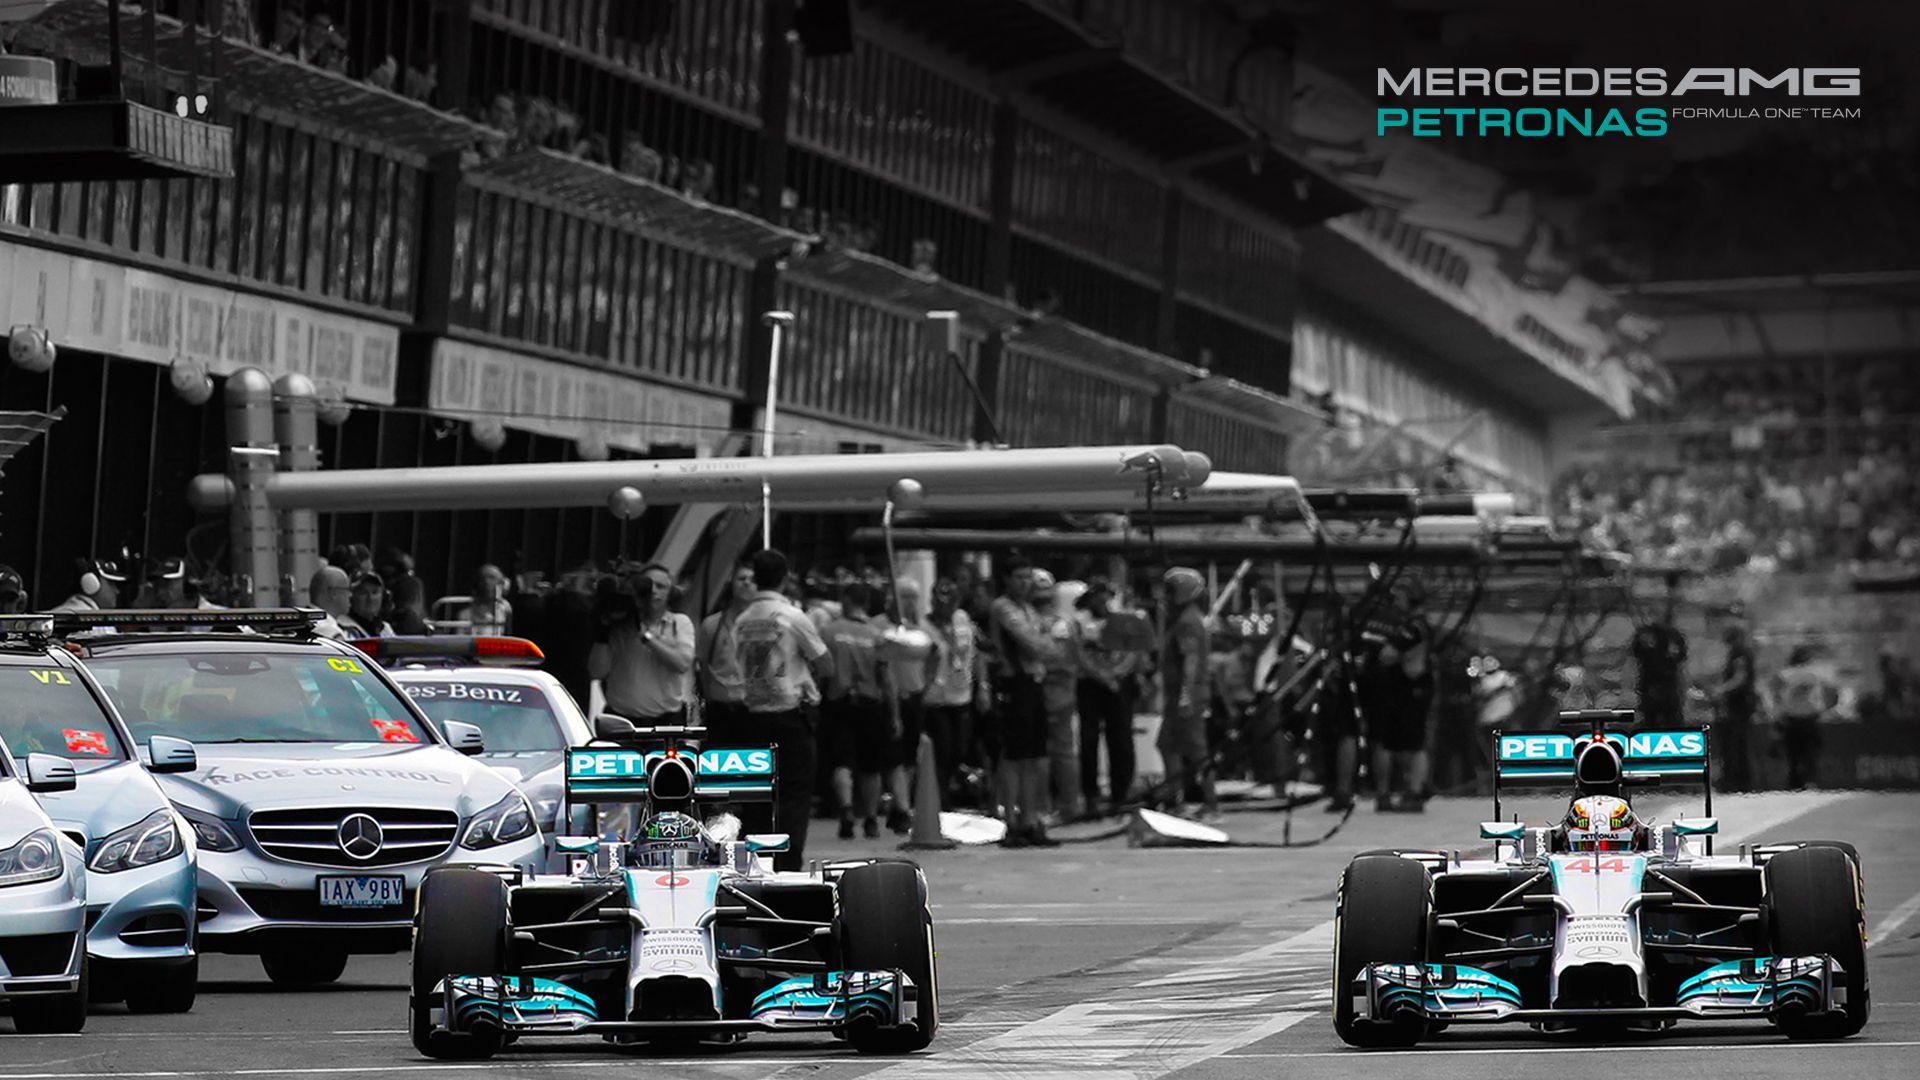 Explore And Share Mercedes AMG Petronas Wallpaper On WallpaperSafari